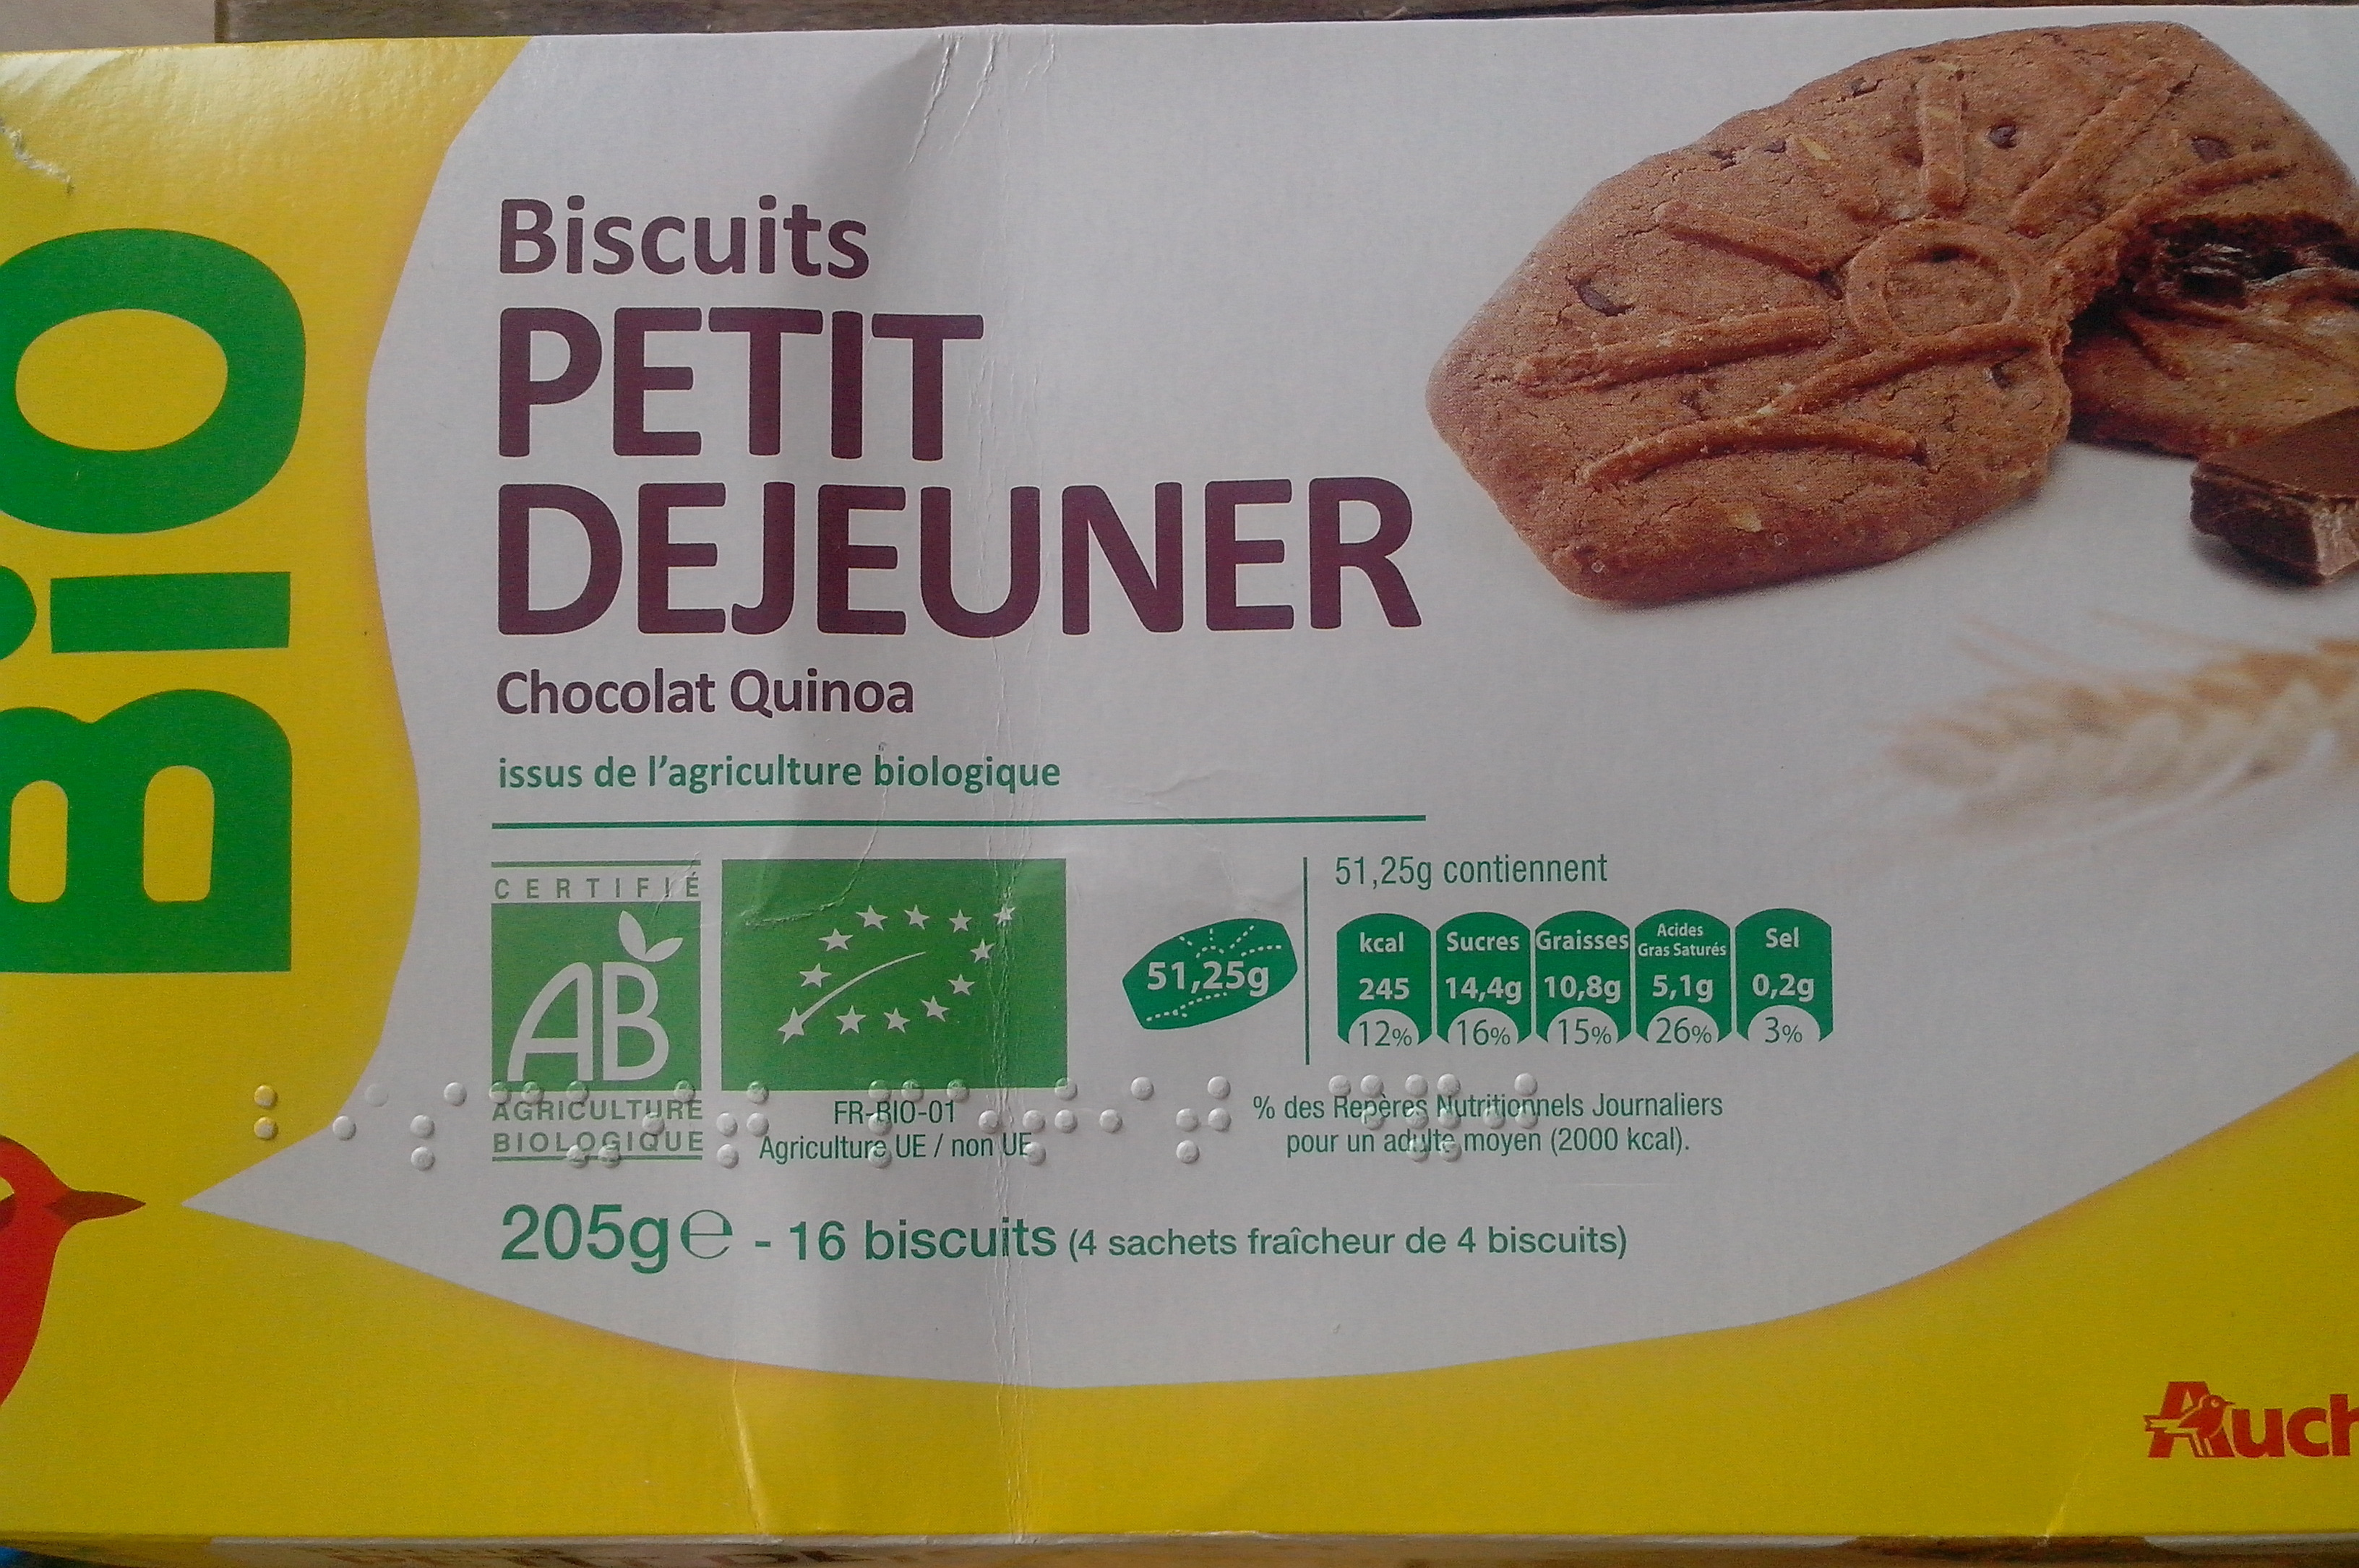 Biscuits Petit Déjeuner Chocolat Quinoa - Product